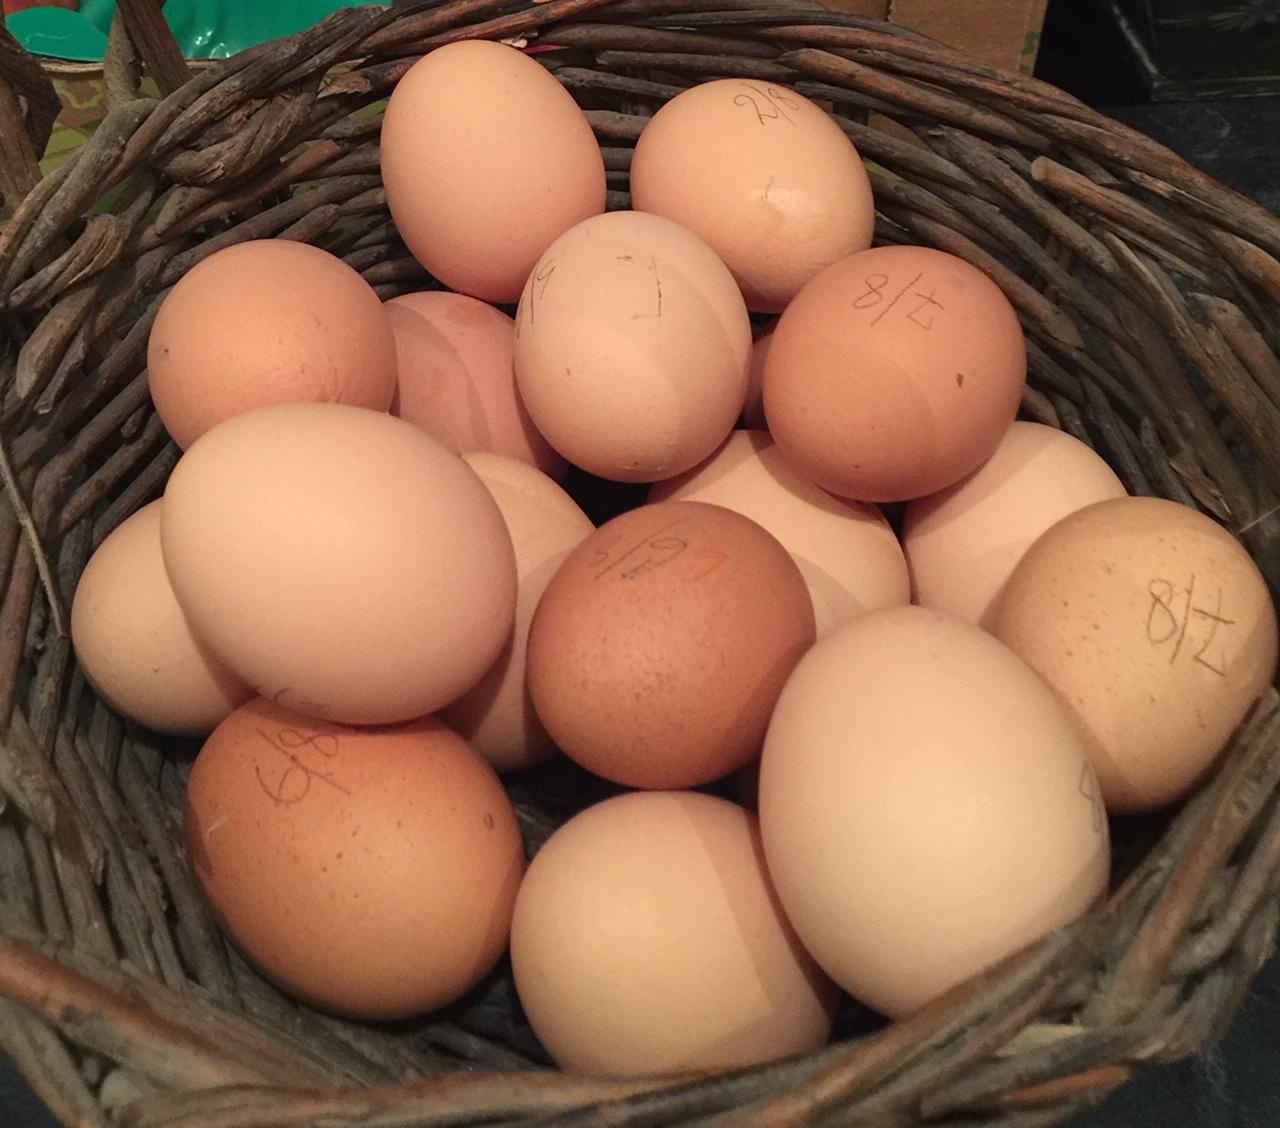 Boîte de 6 œufs gros très frais